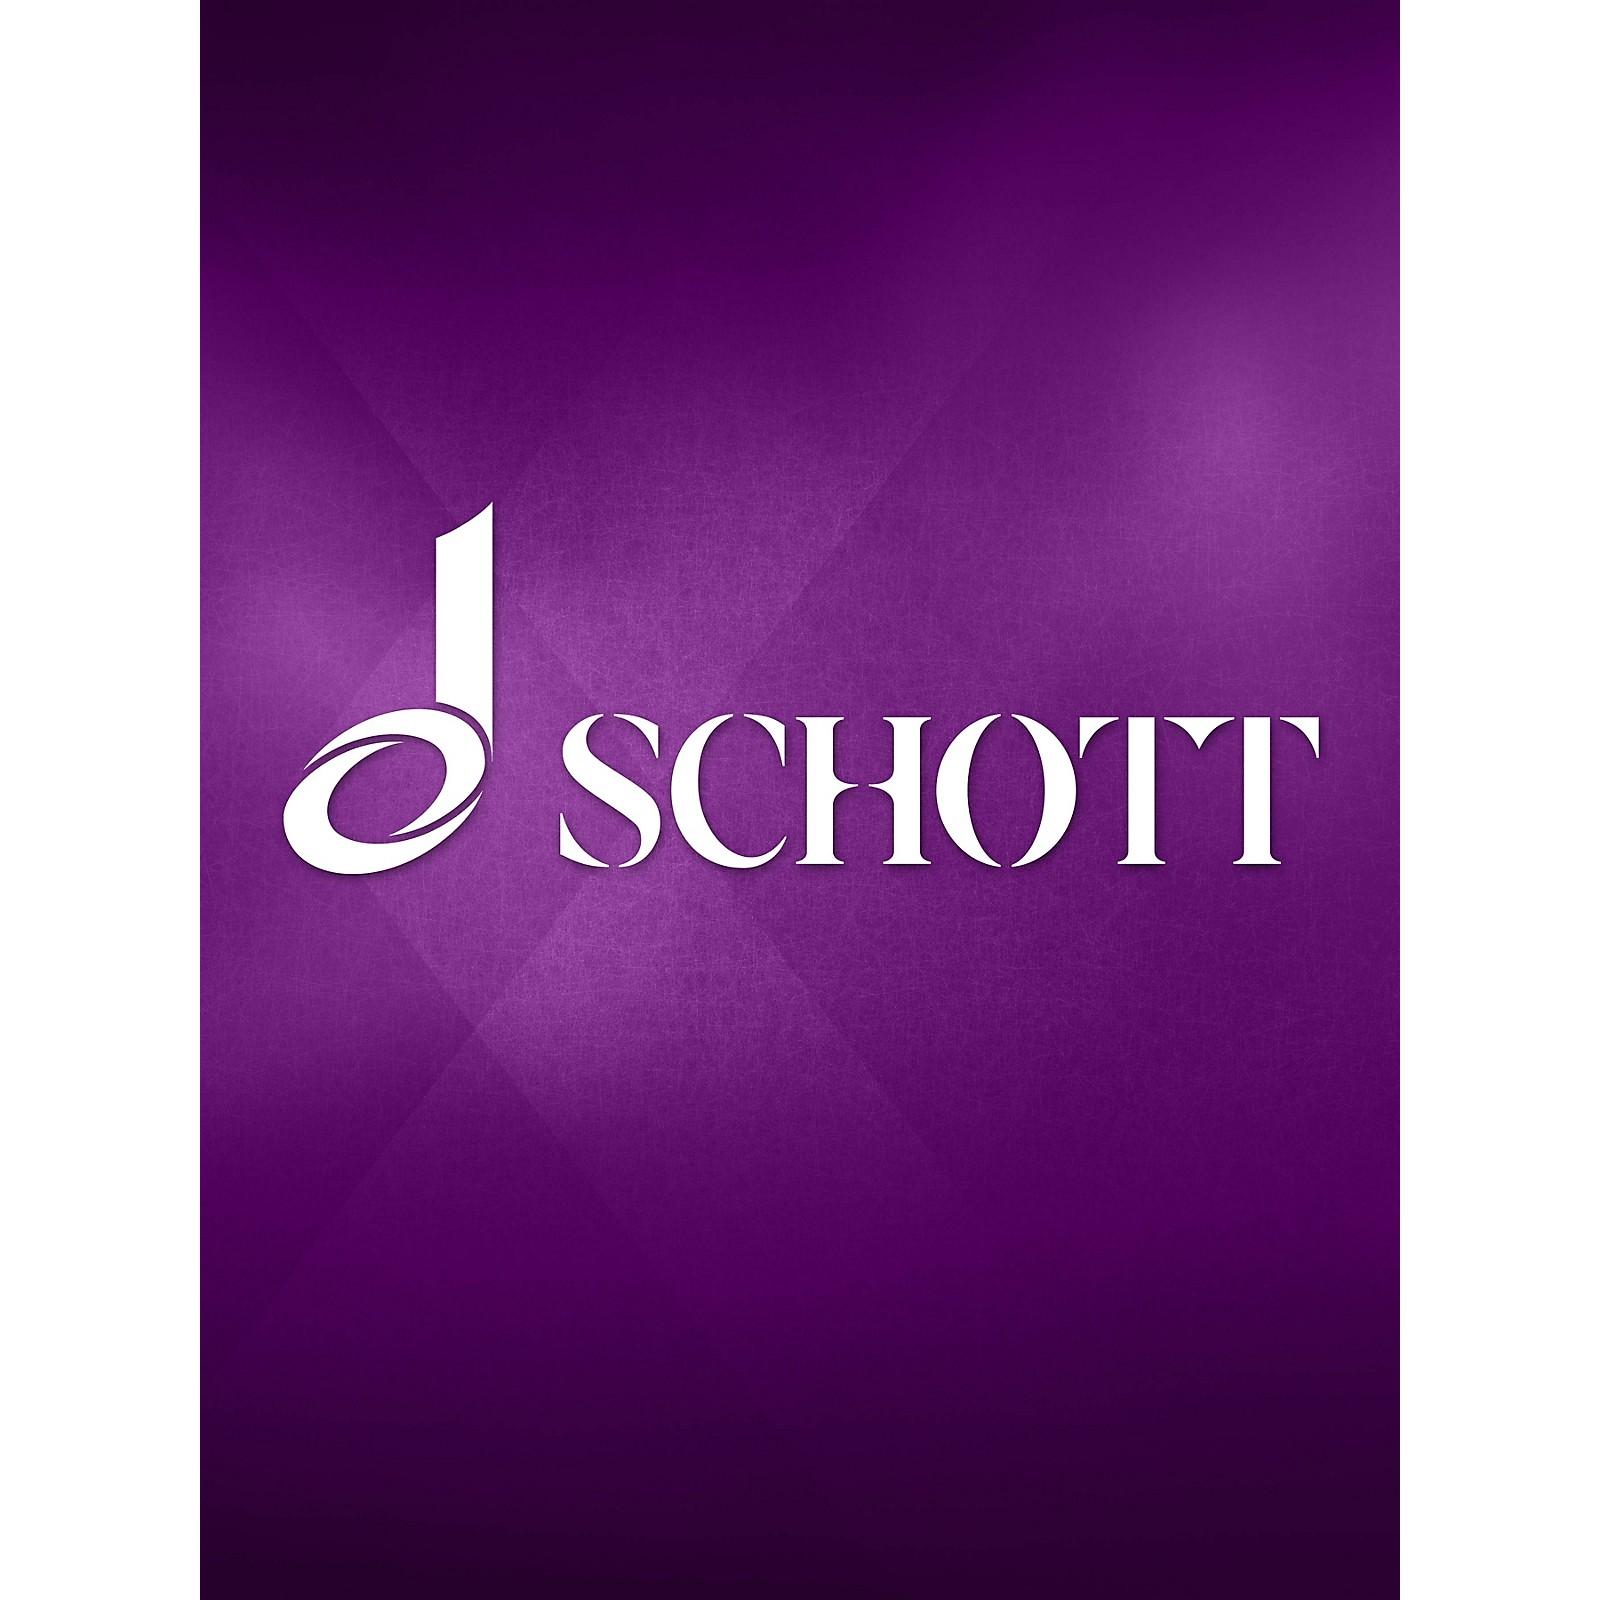 Eulenburg Violin Concerto in G Major (Solo Violin Part) Schott Series Composed by Carl Stamitz